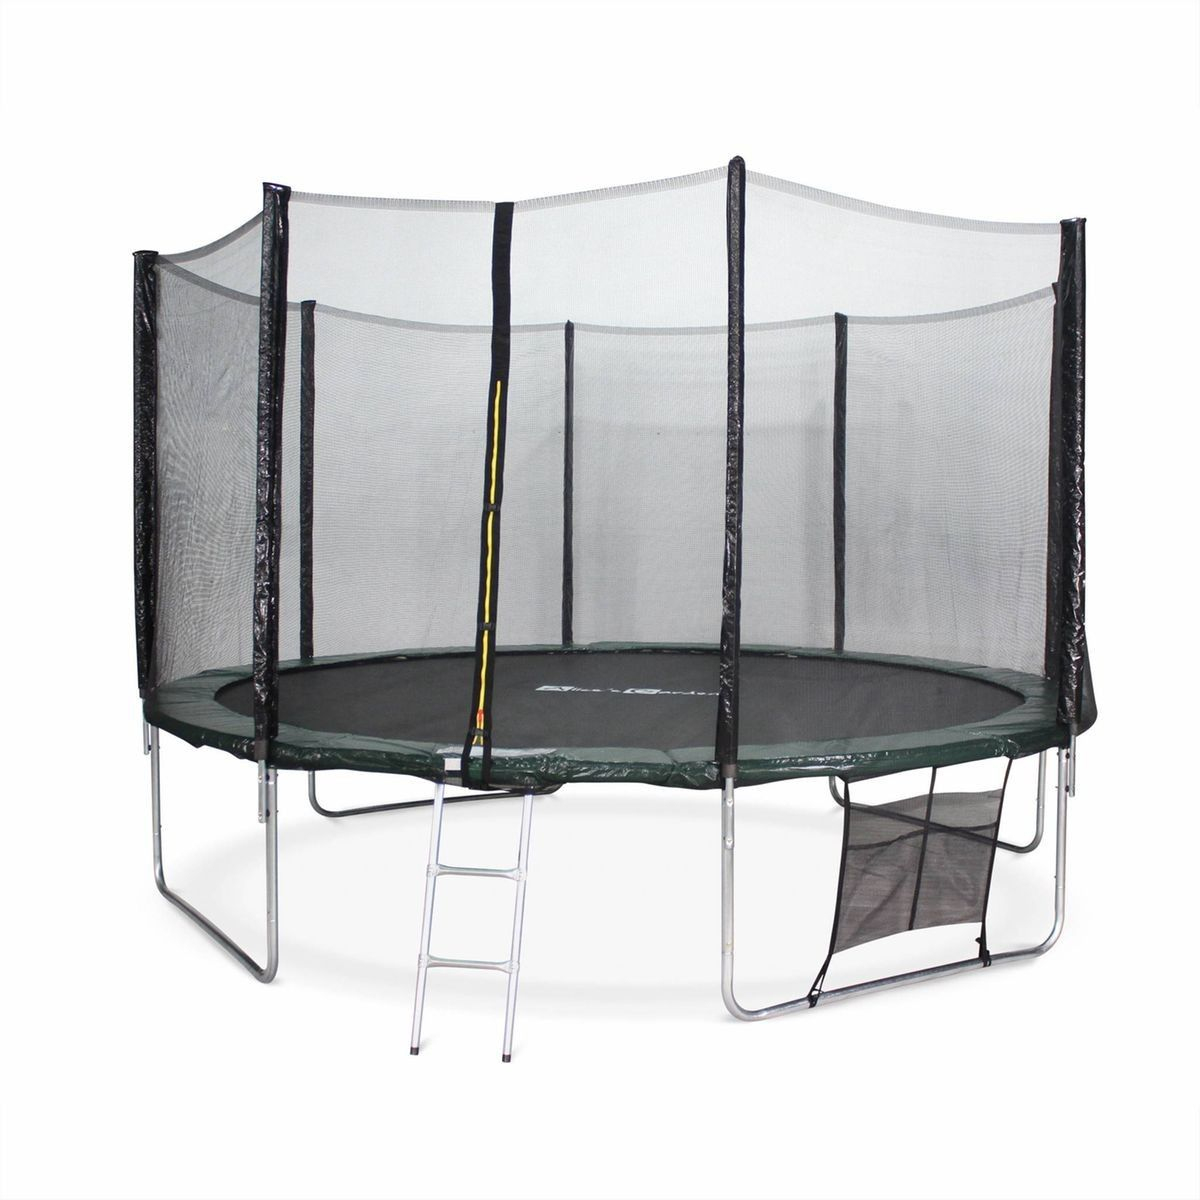 Trampoline De Jardin Mercure Xxl 400Cm Vert Et Filet De ... intérieur Filet De Protection Jardin